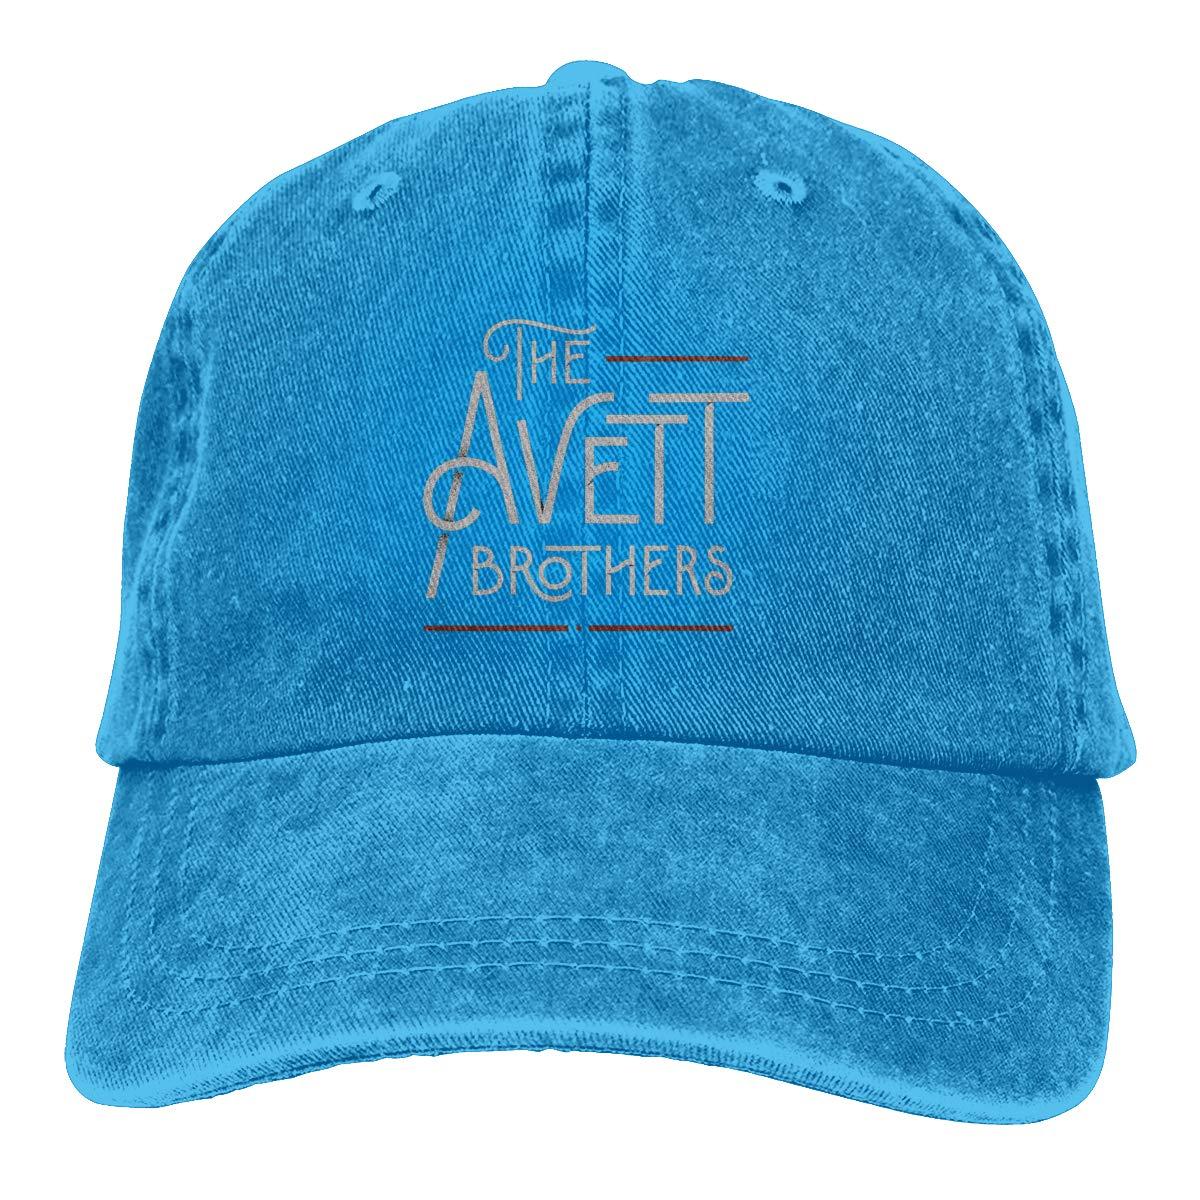 The Avett Brothers Unisex Baseball Cap Twill Adjustable Hat